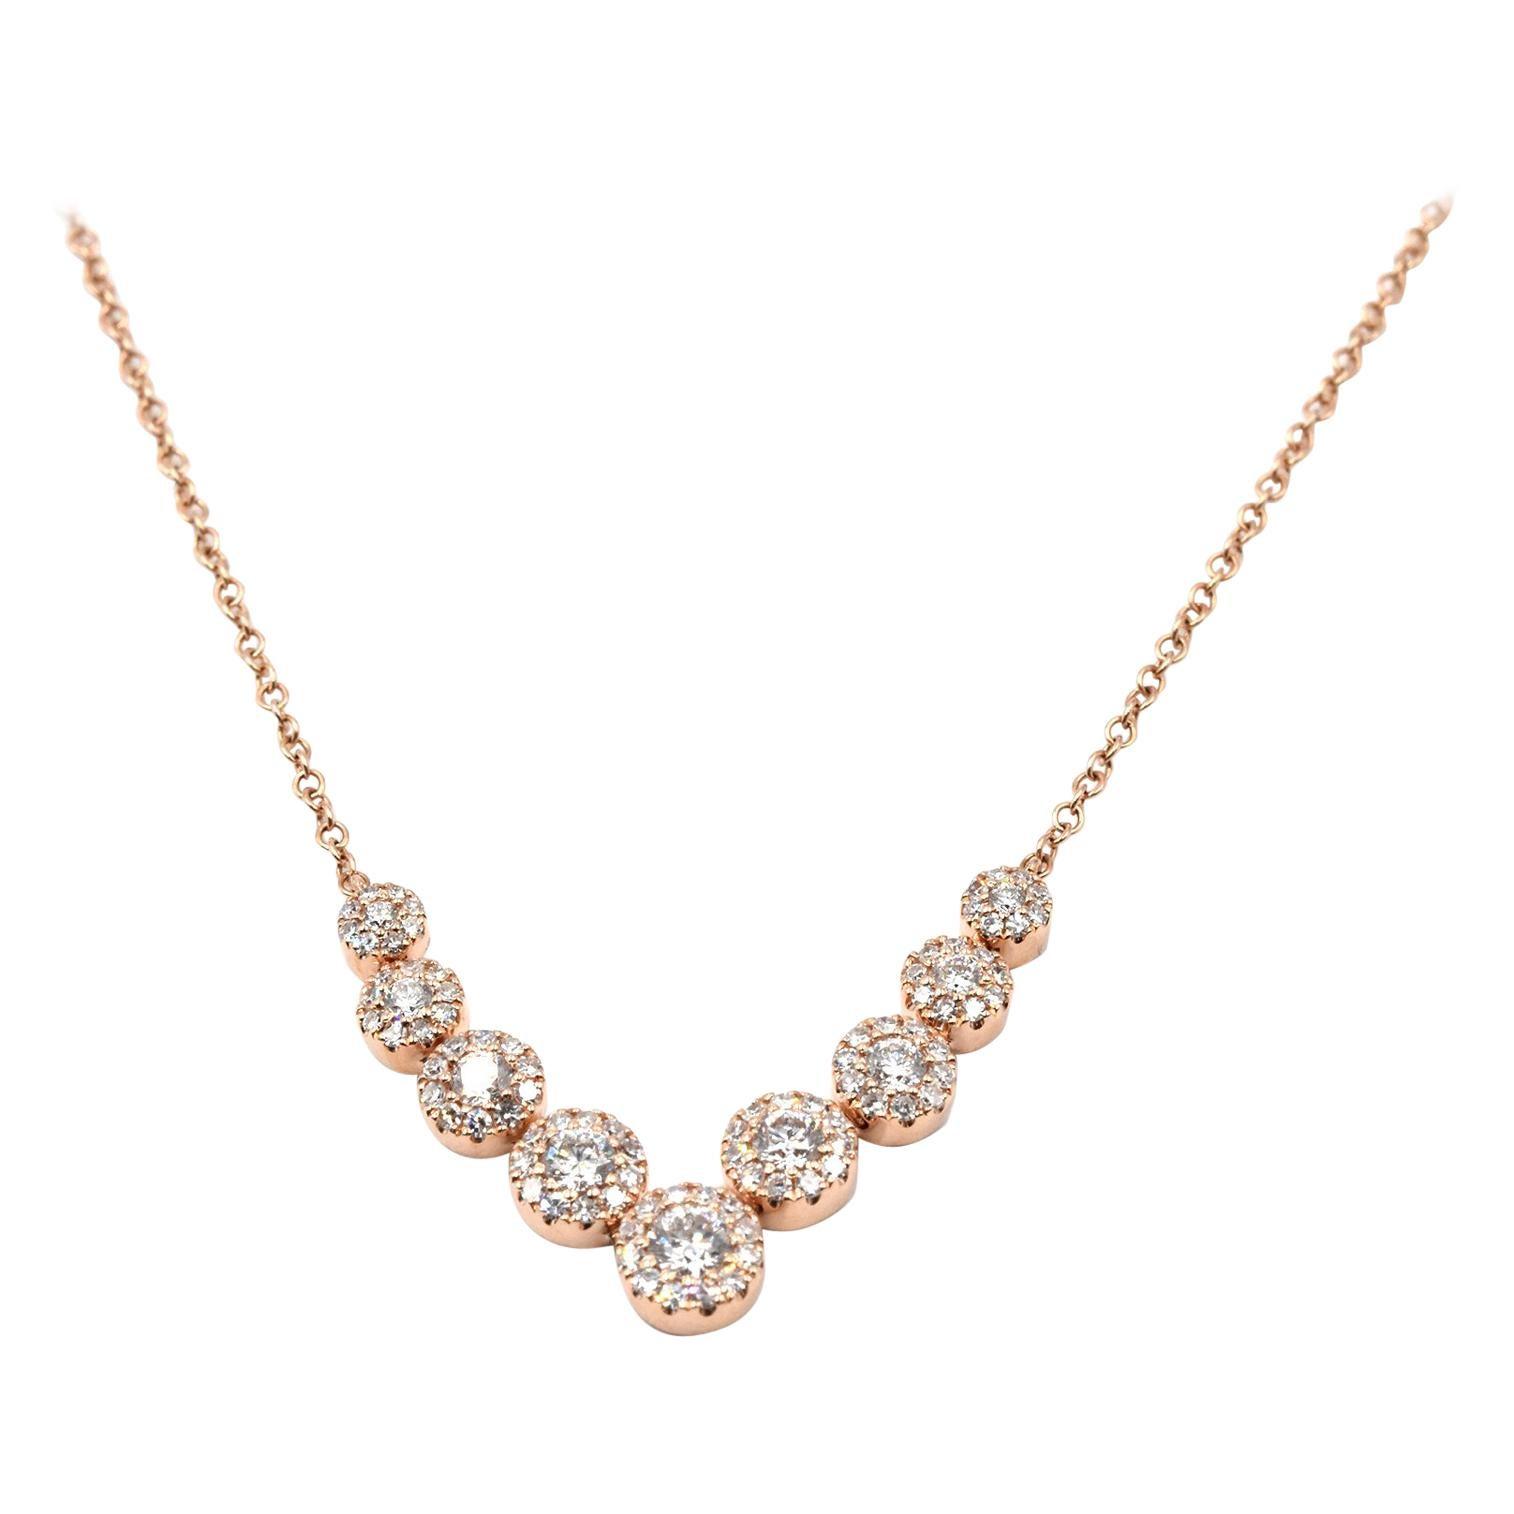 .56 Carat Diamond 14 Karat Rose Gold Diamond Cluster Necklace